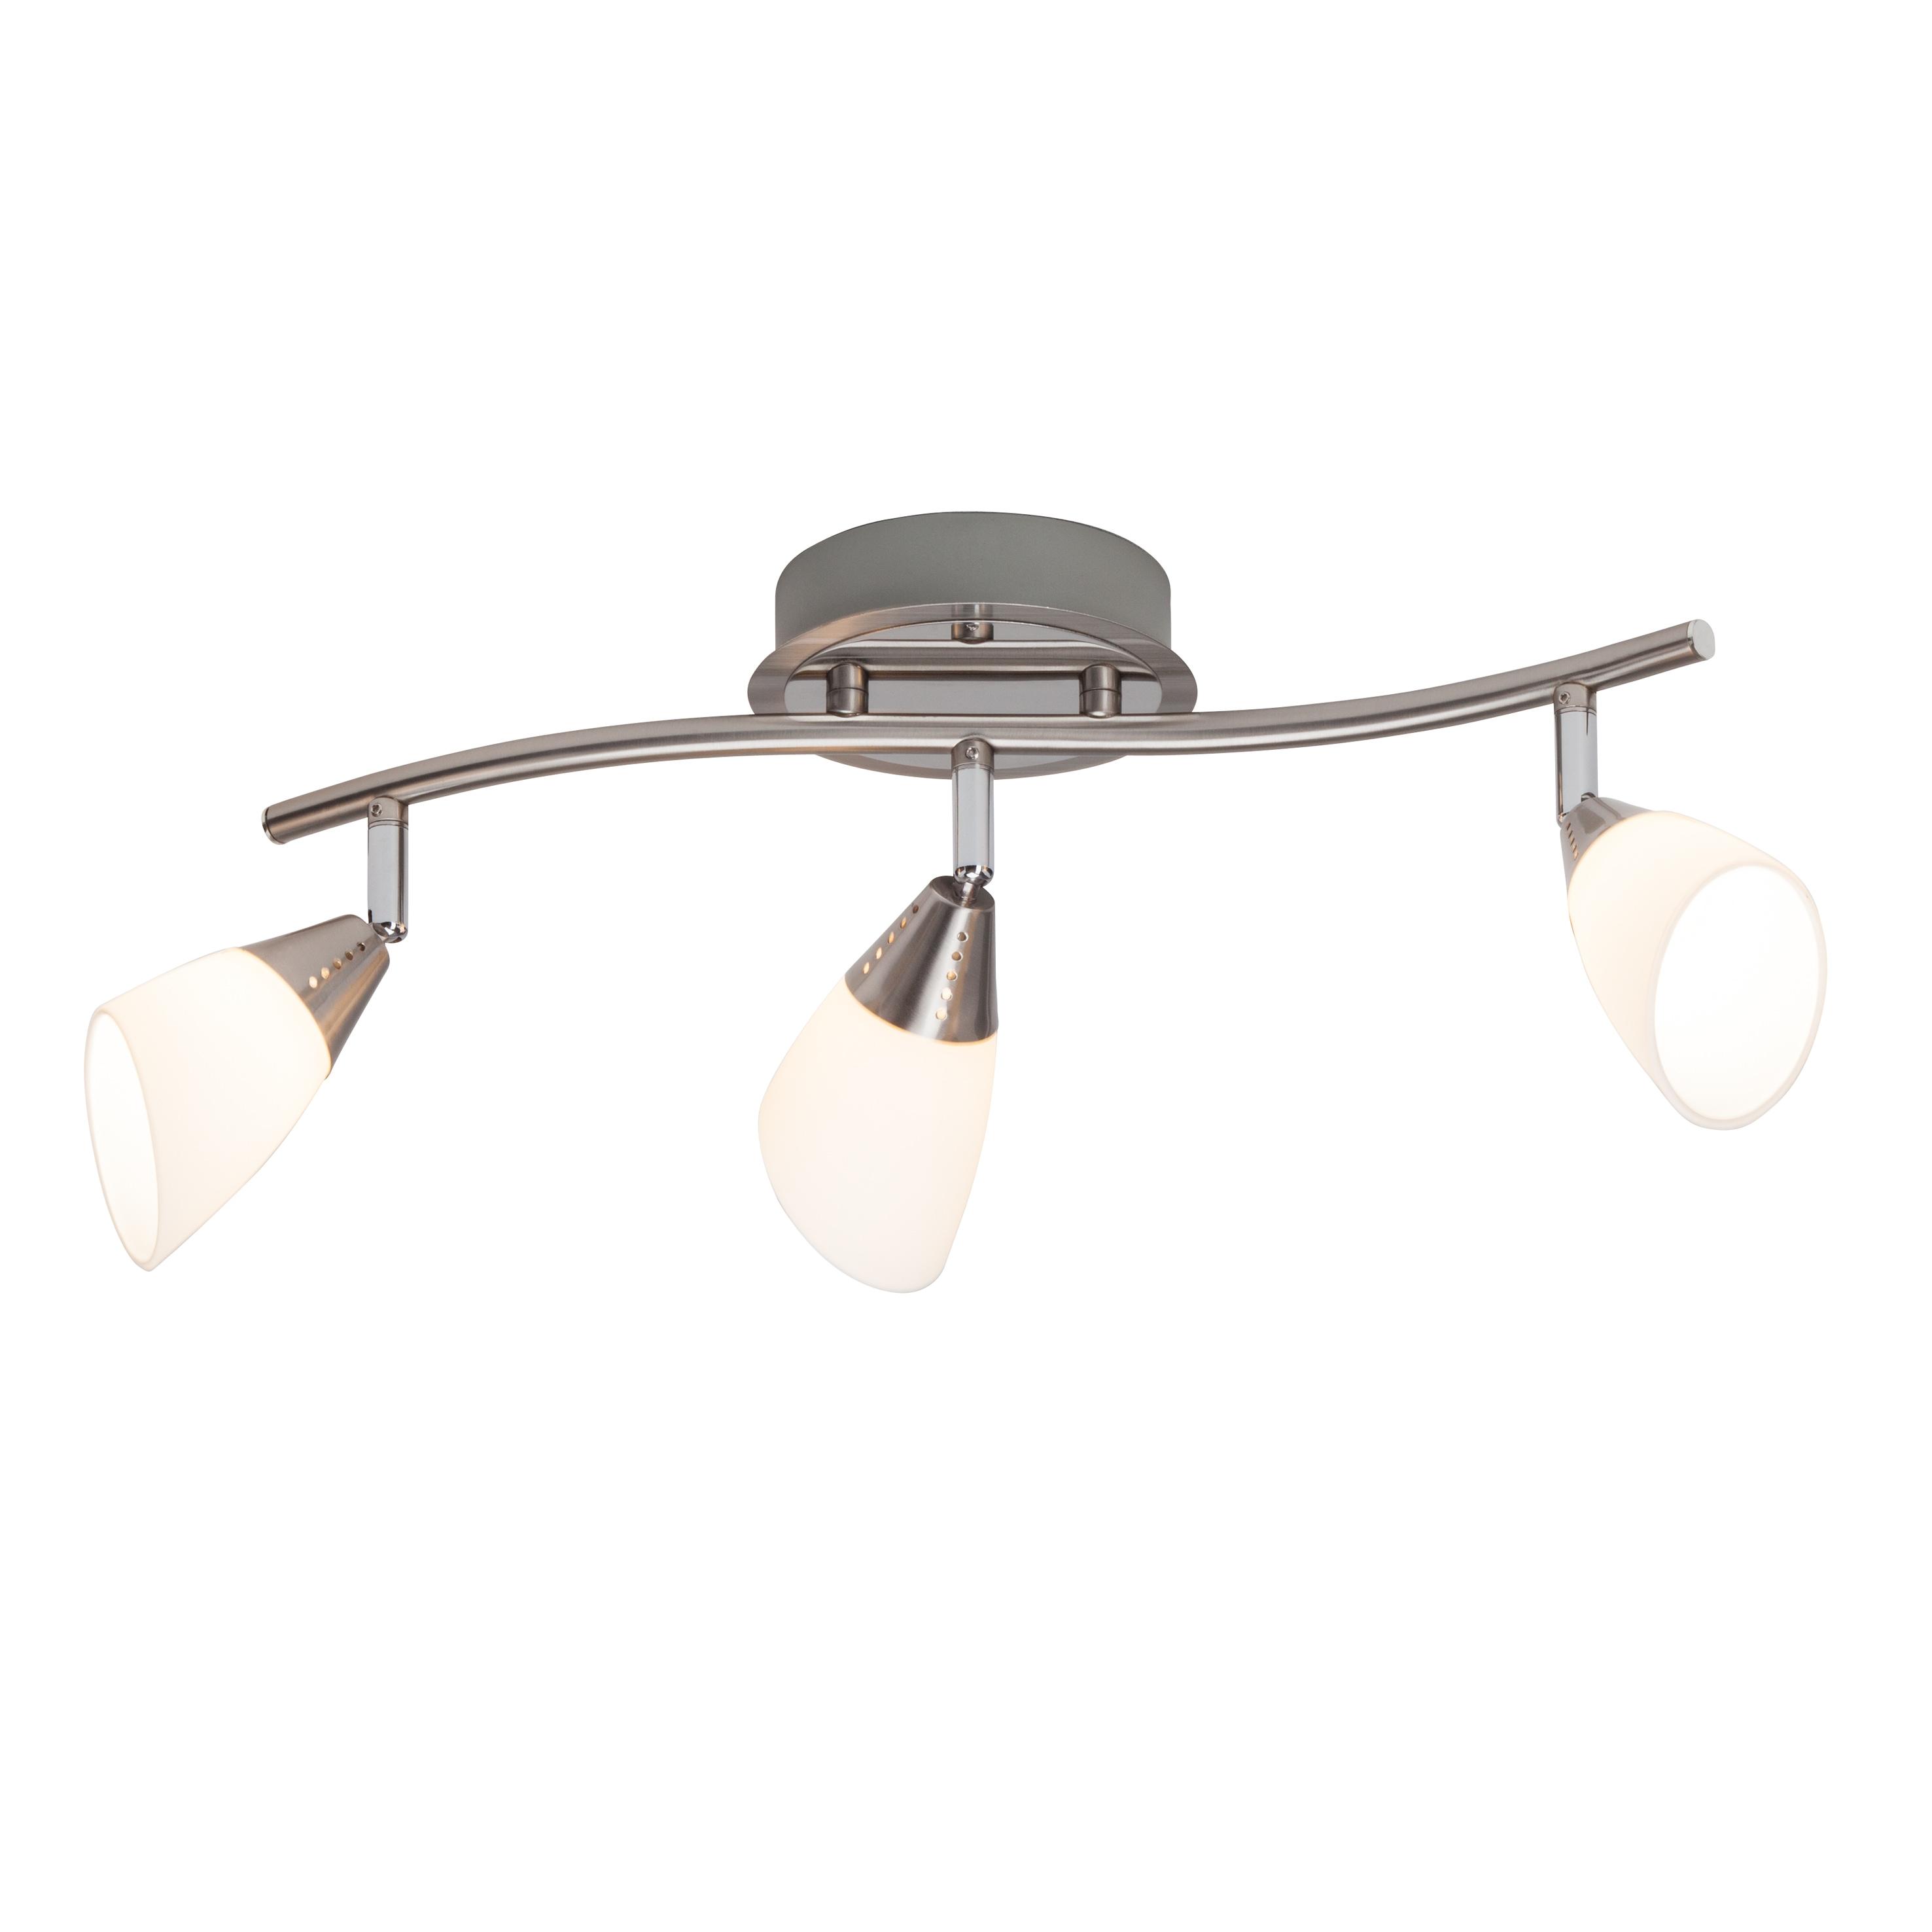 Brilliant Leuchten Opalina LED Spotrohr 3flg eisen chrom/weiß